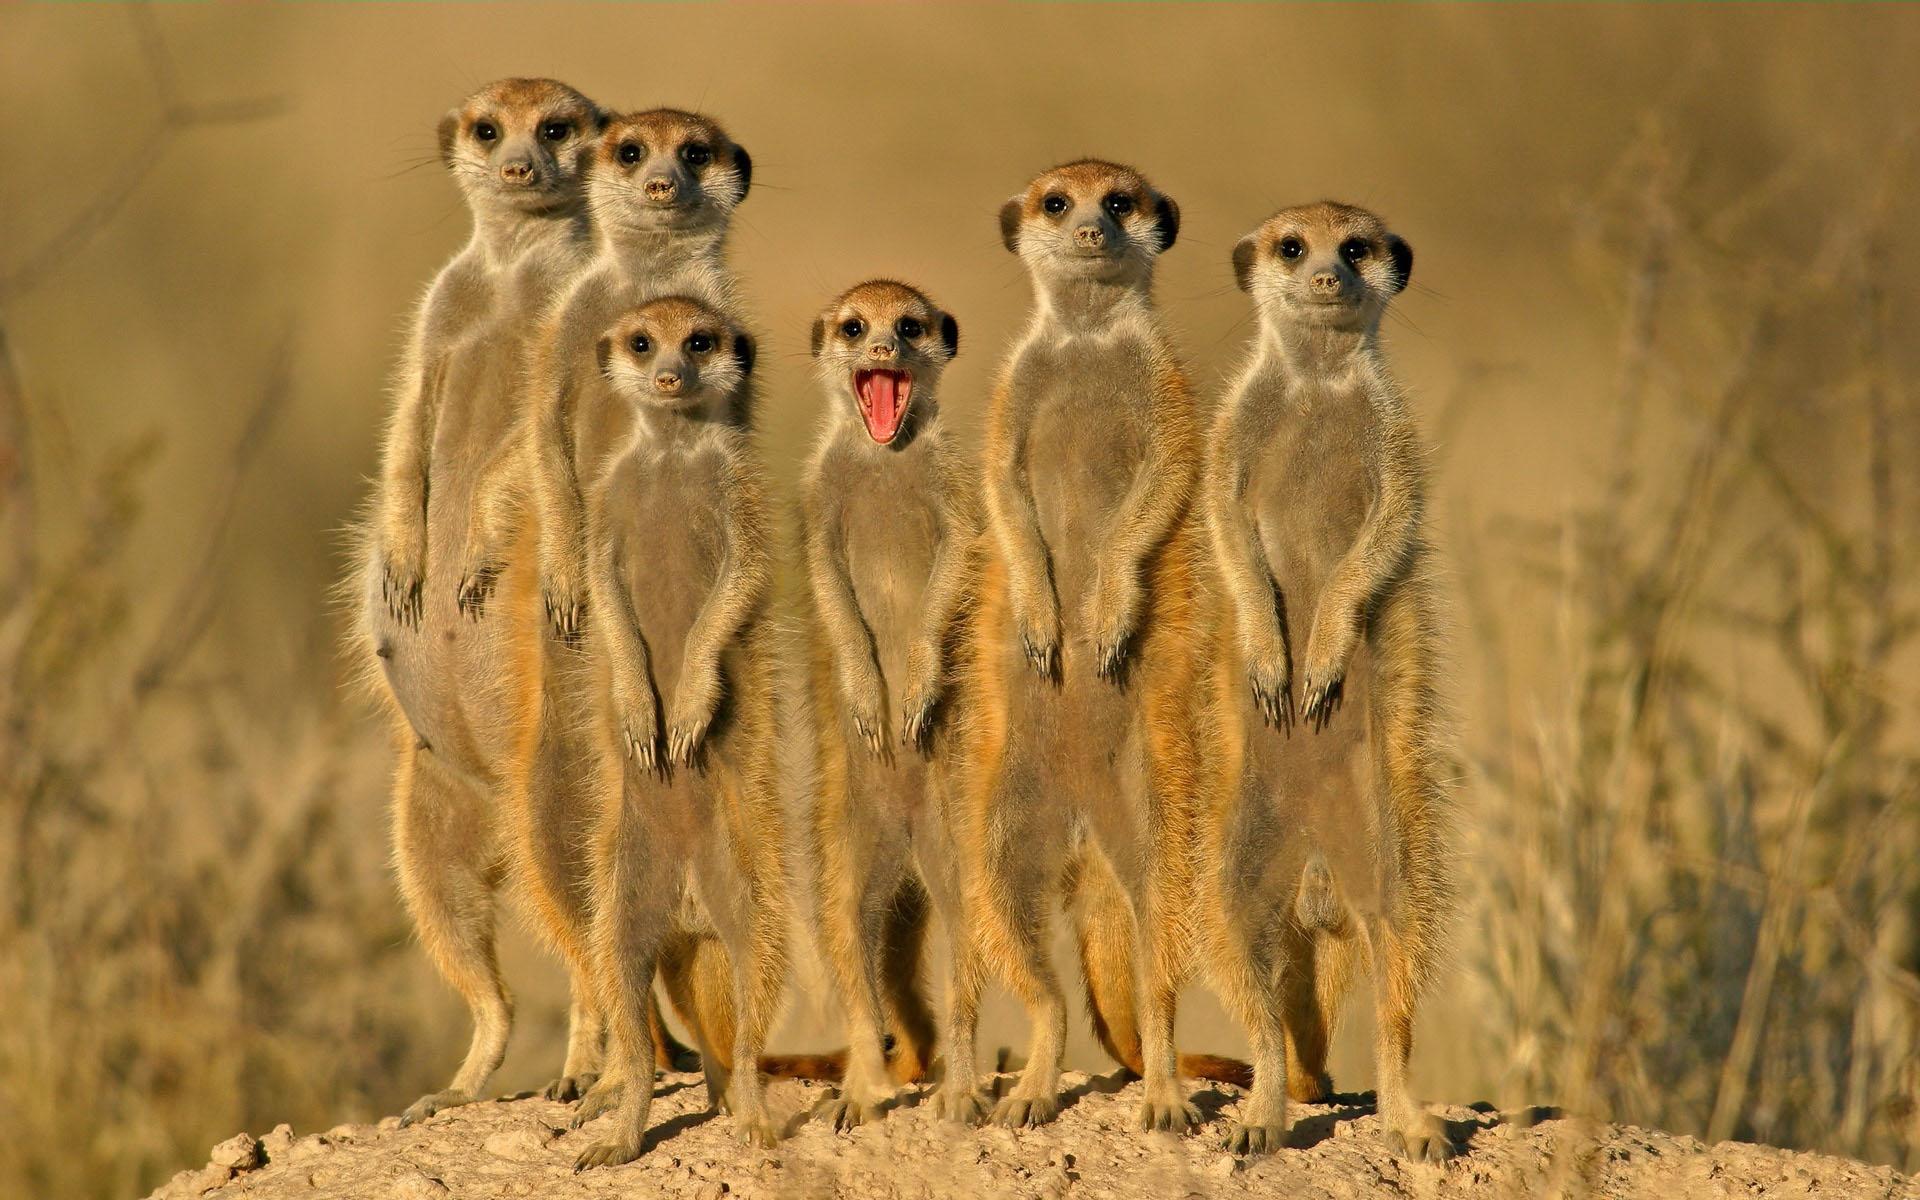 desert-meerkats-smile-砂漠ミーアキャット笑顔 (1)